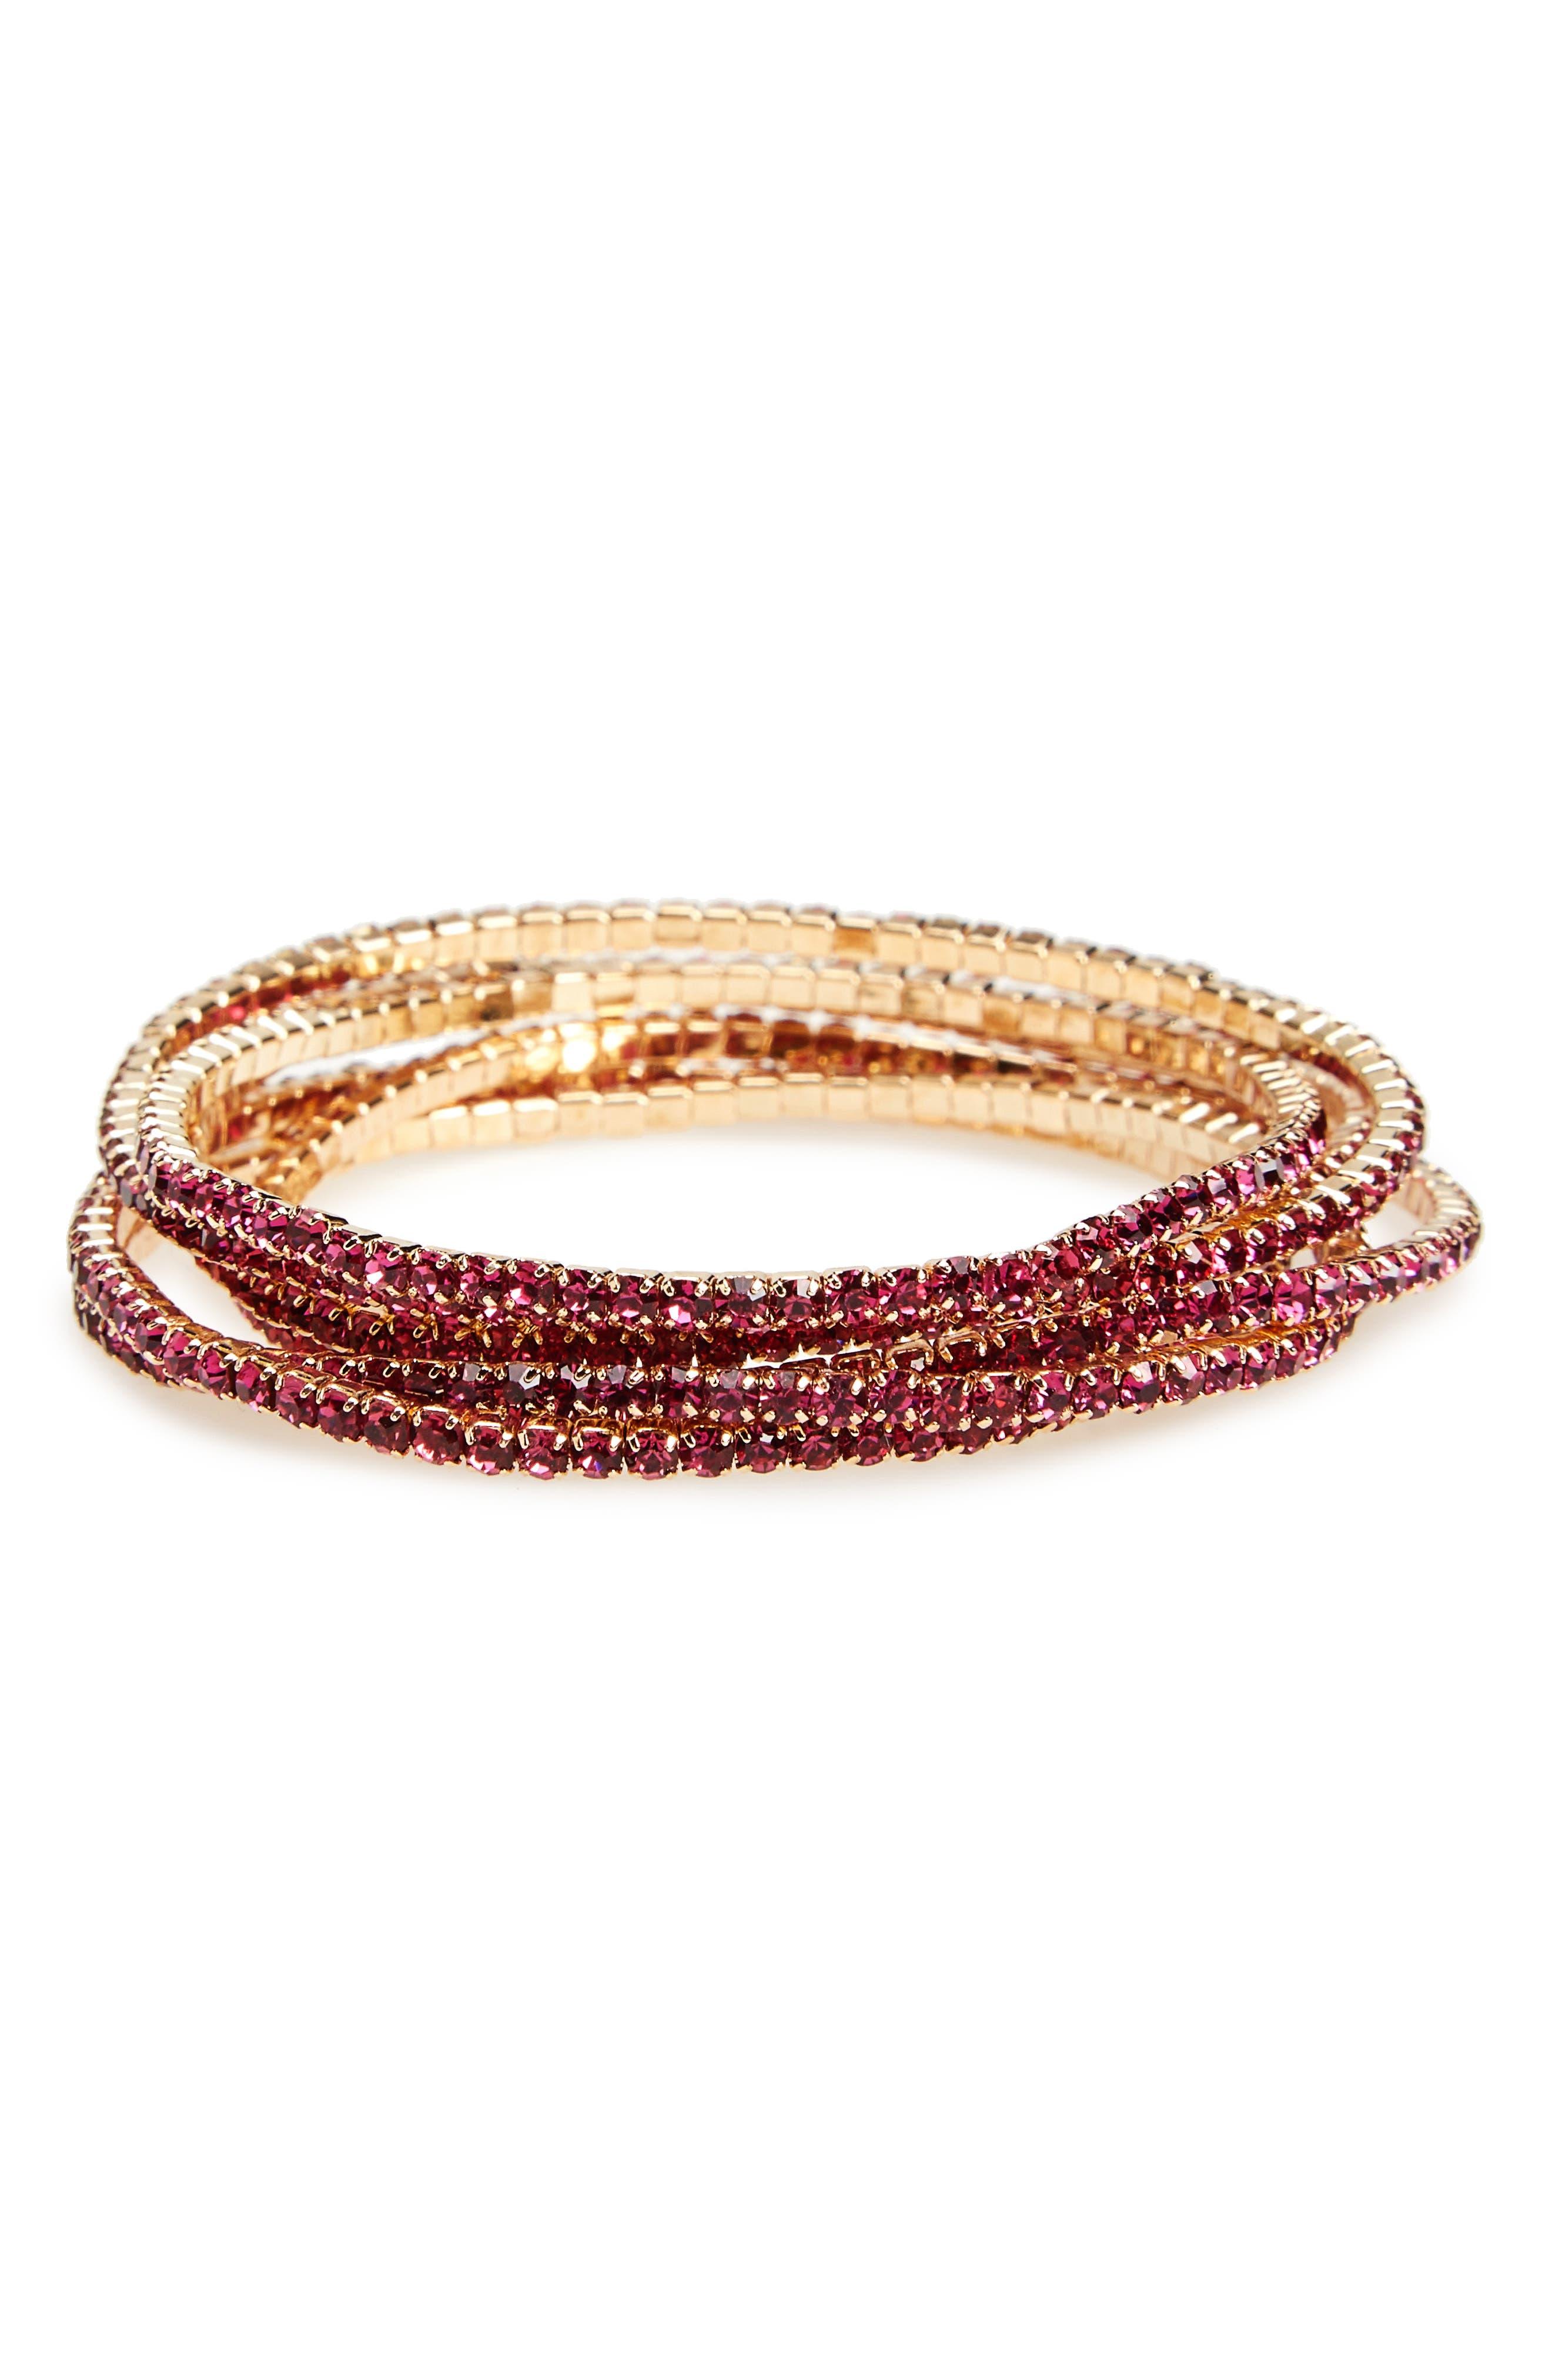 Panacea Pack of 6 Stretch Bracelets